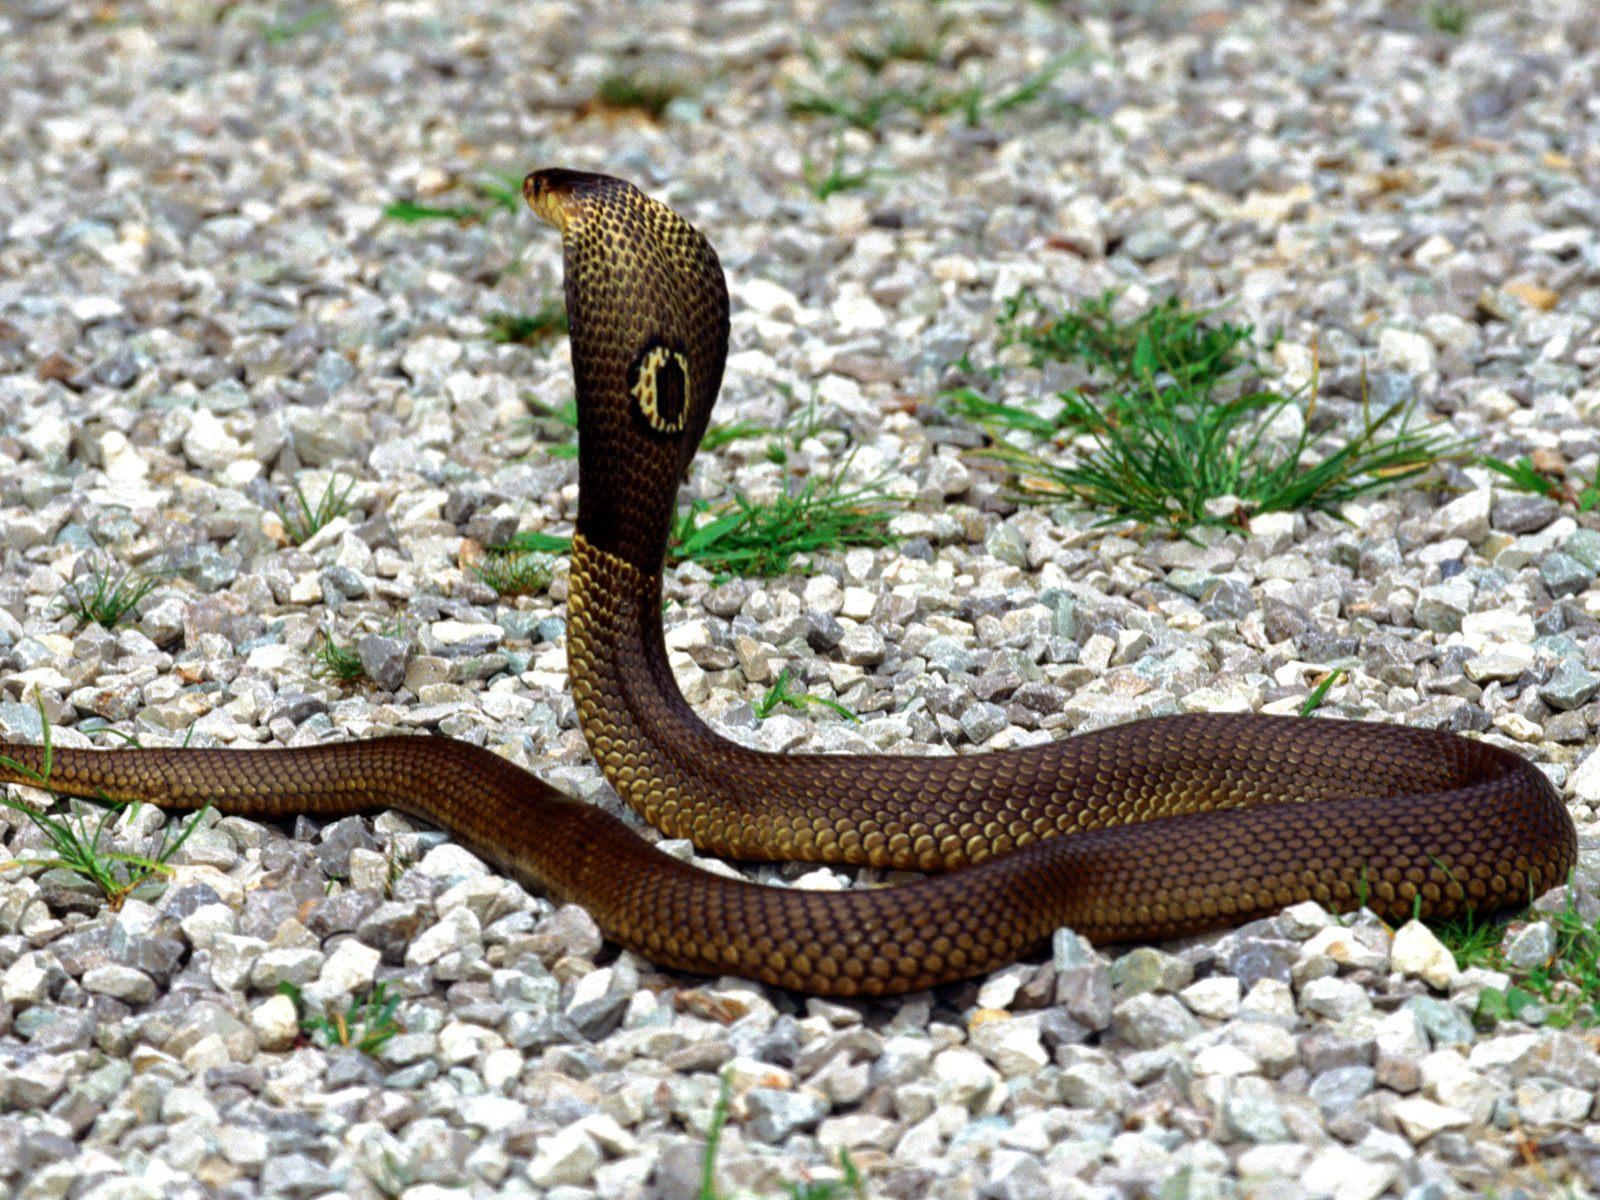 snake themes snake themes snake themes snake themes snake images snake 1600x1200